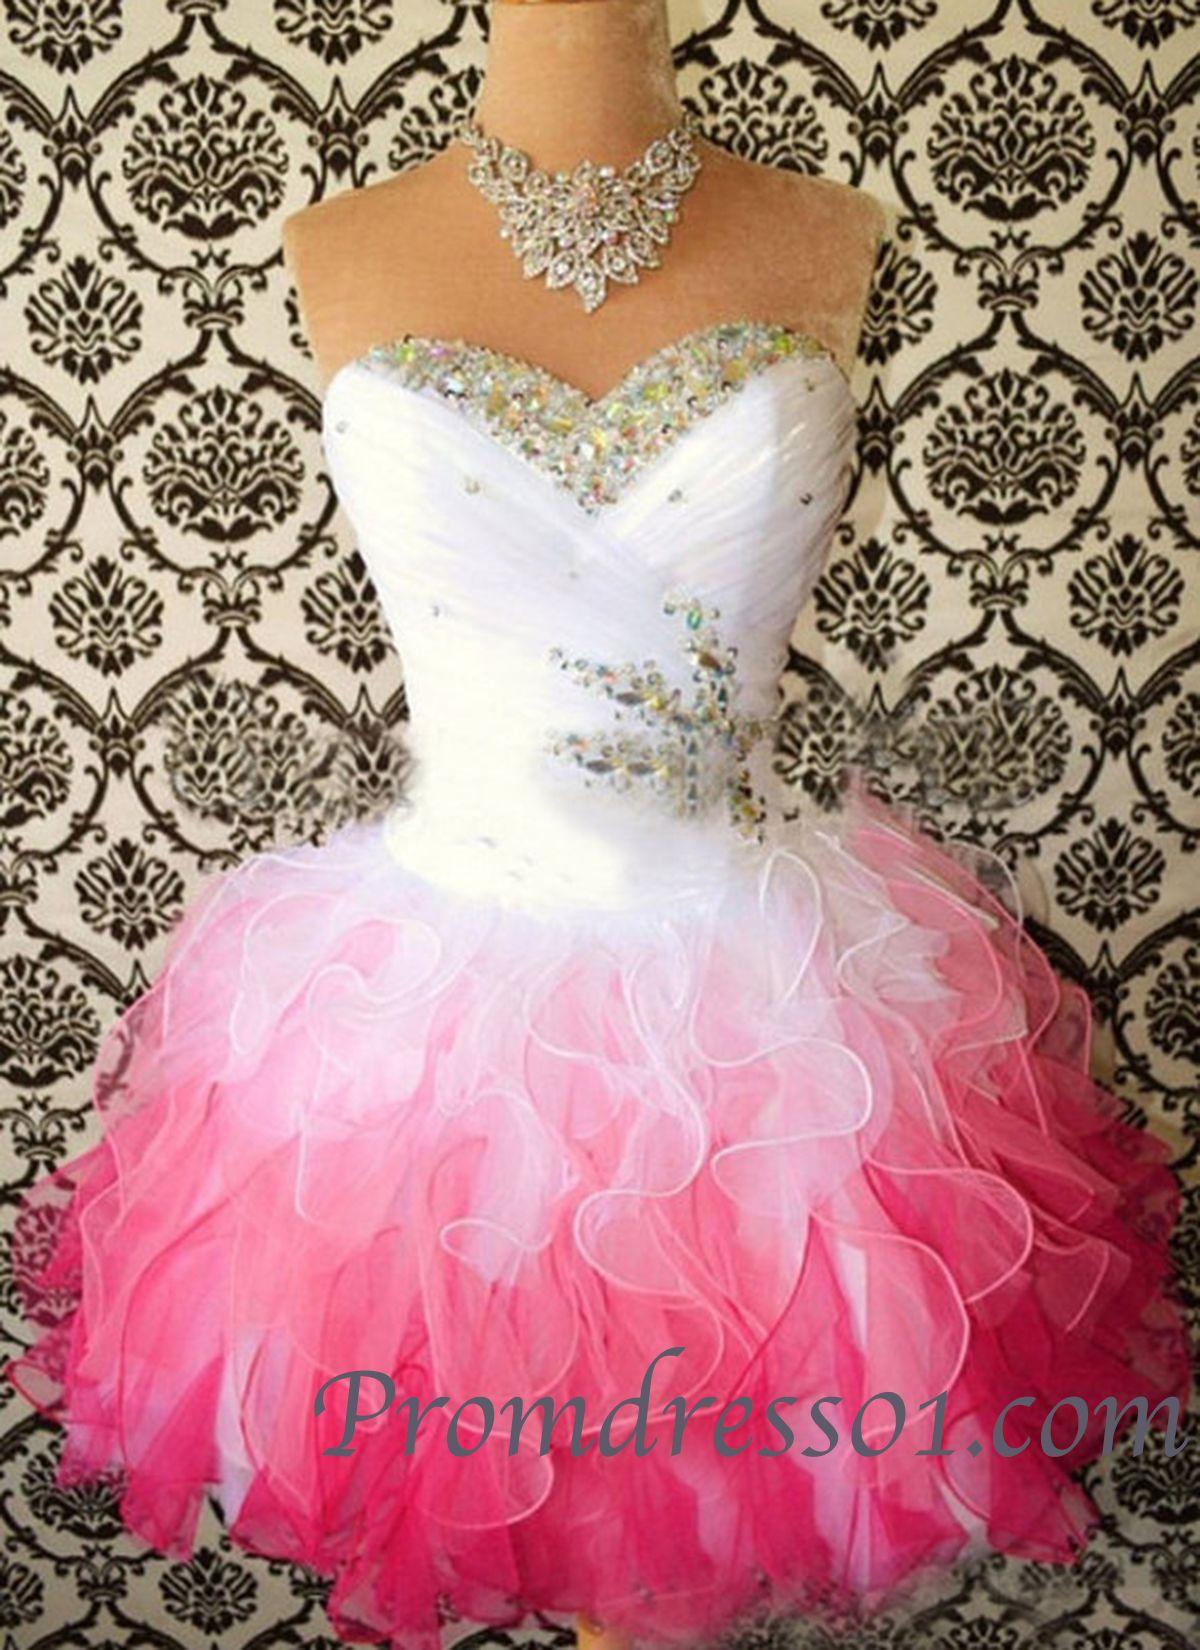 Prom Dress 2015 Custom Made Dress Prom Dress 01 Strapless Prom Dresses Pink Homecoming Dress Prom Dresses